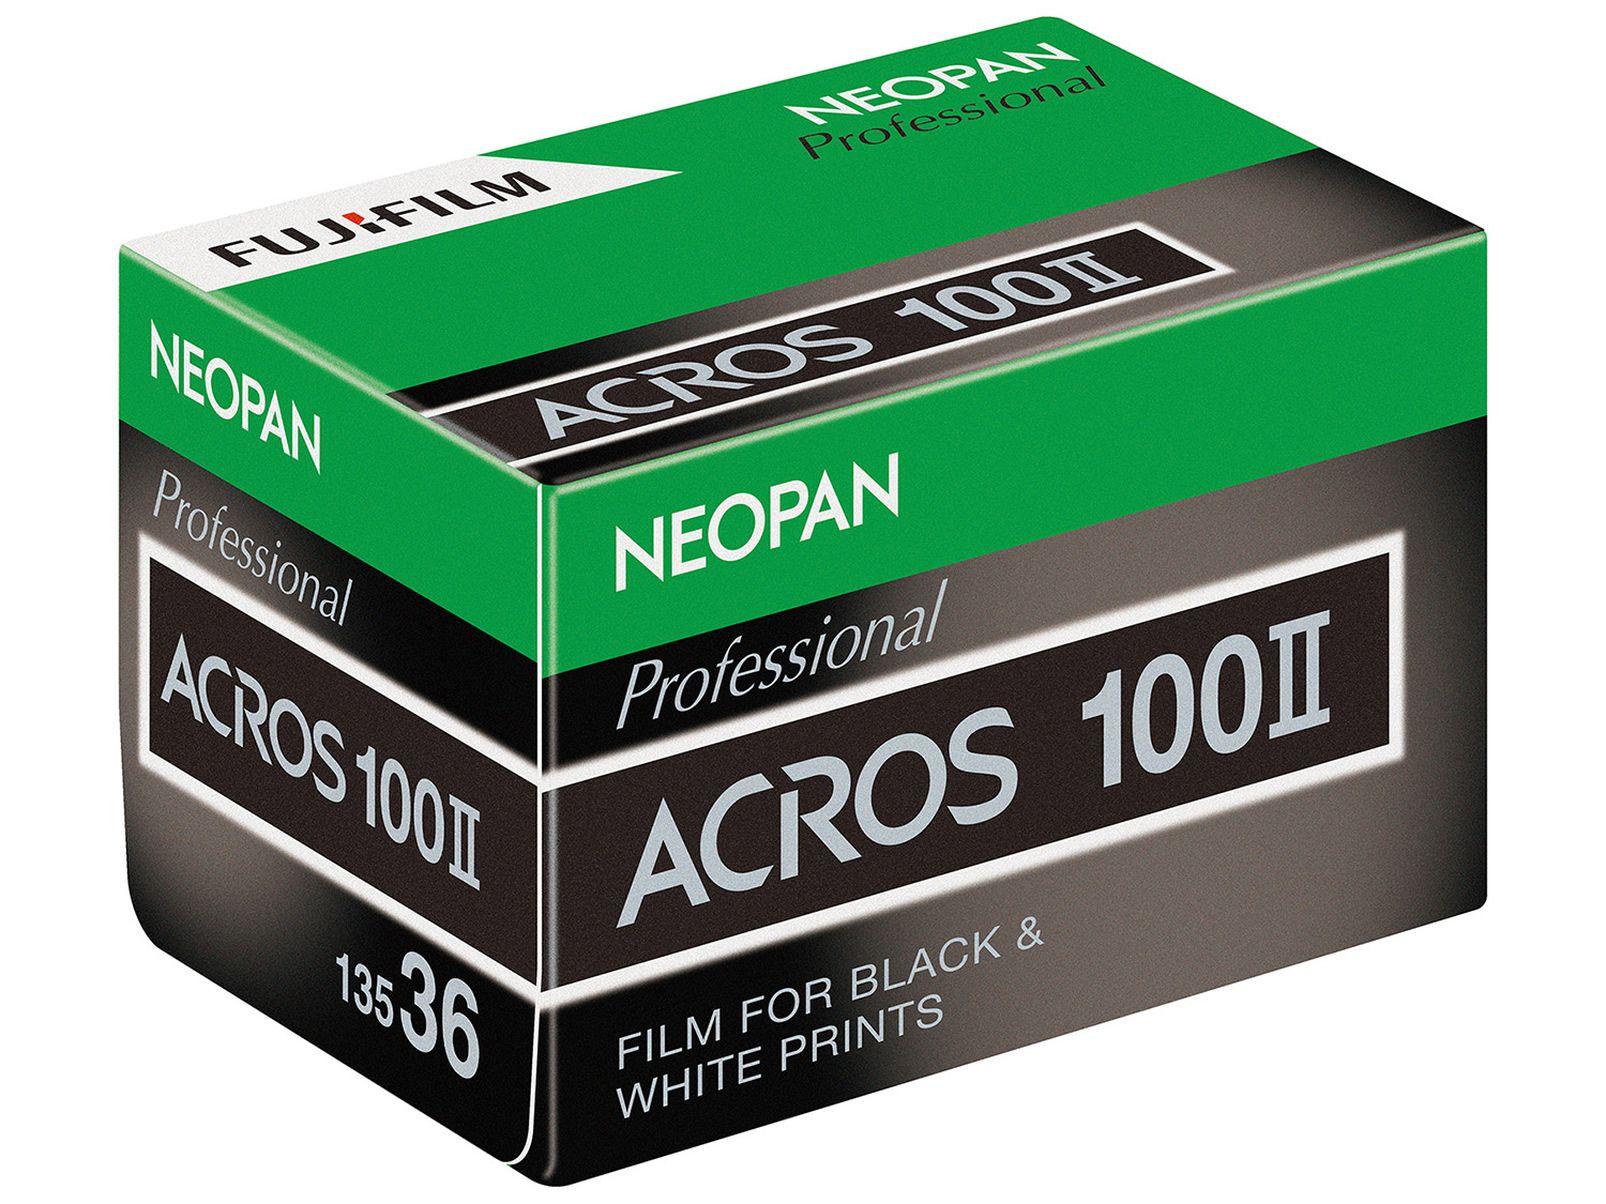 Fujifilm Neopan 100 Acros II film